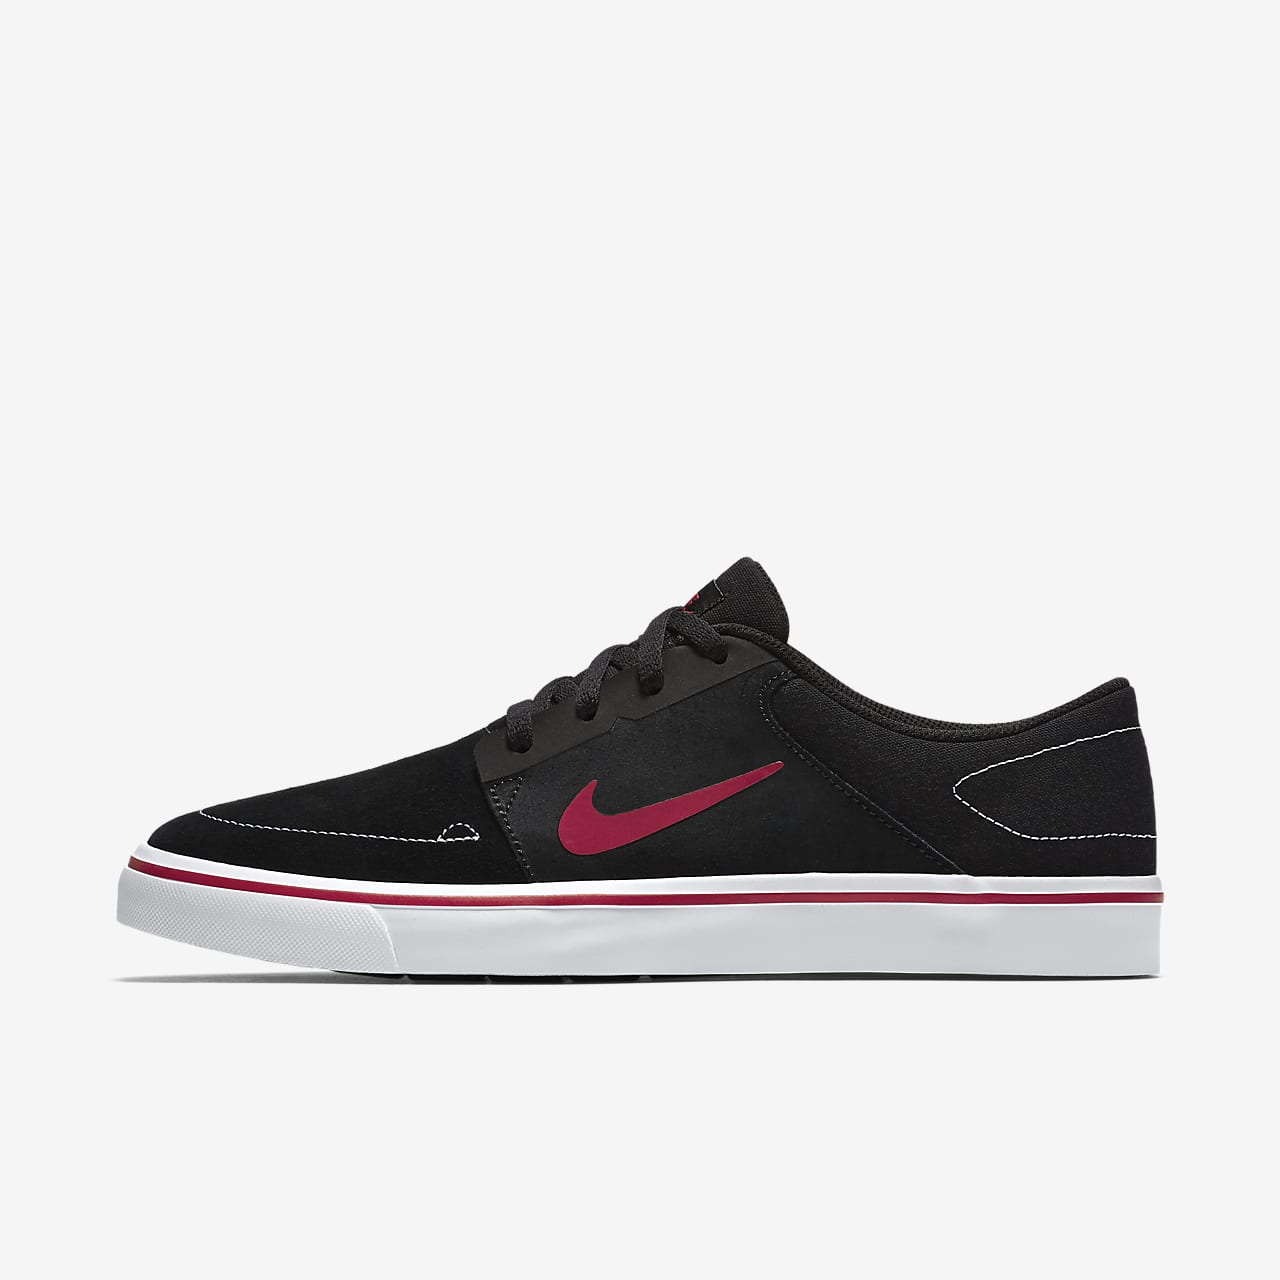 Nike SB Portmore Sabatilles de skateboard - Unisex